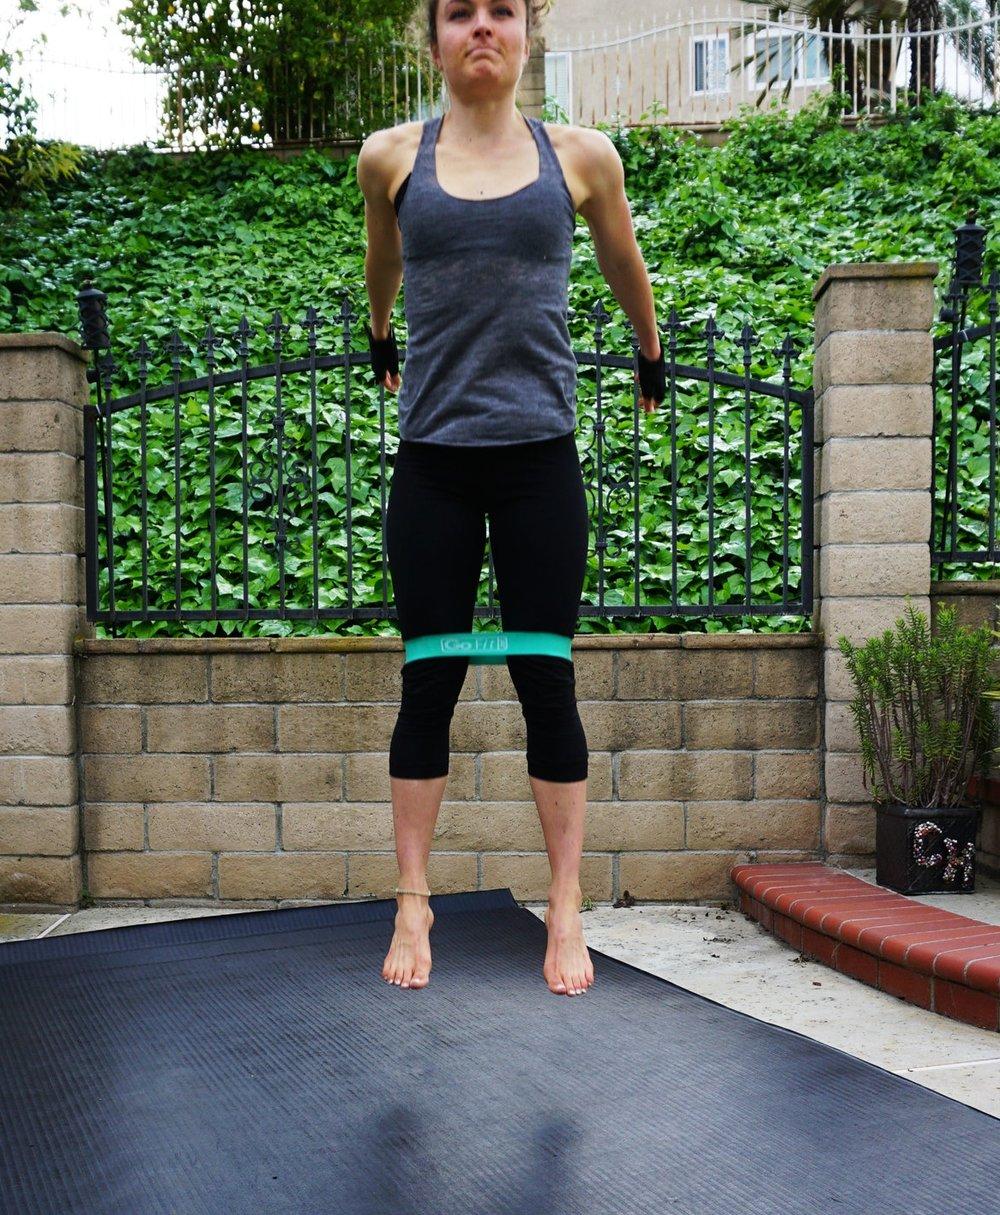 resisted squat jump.jpg